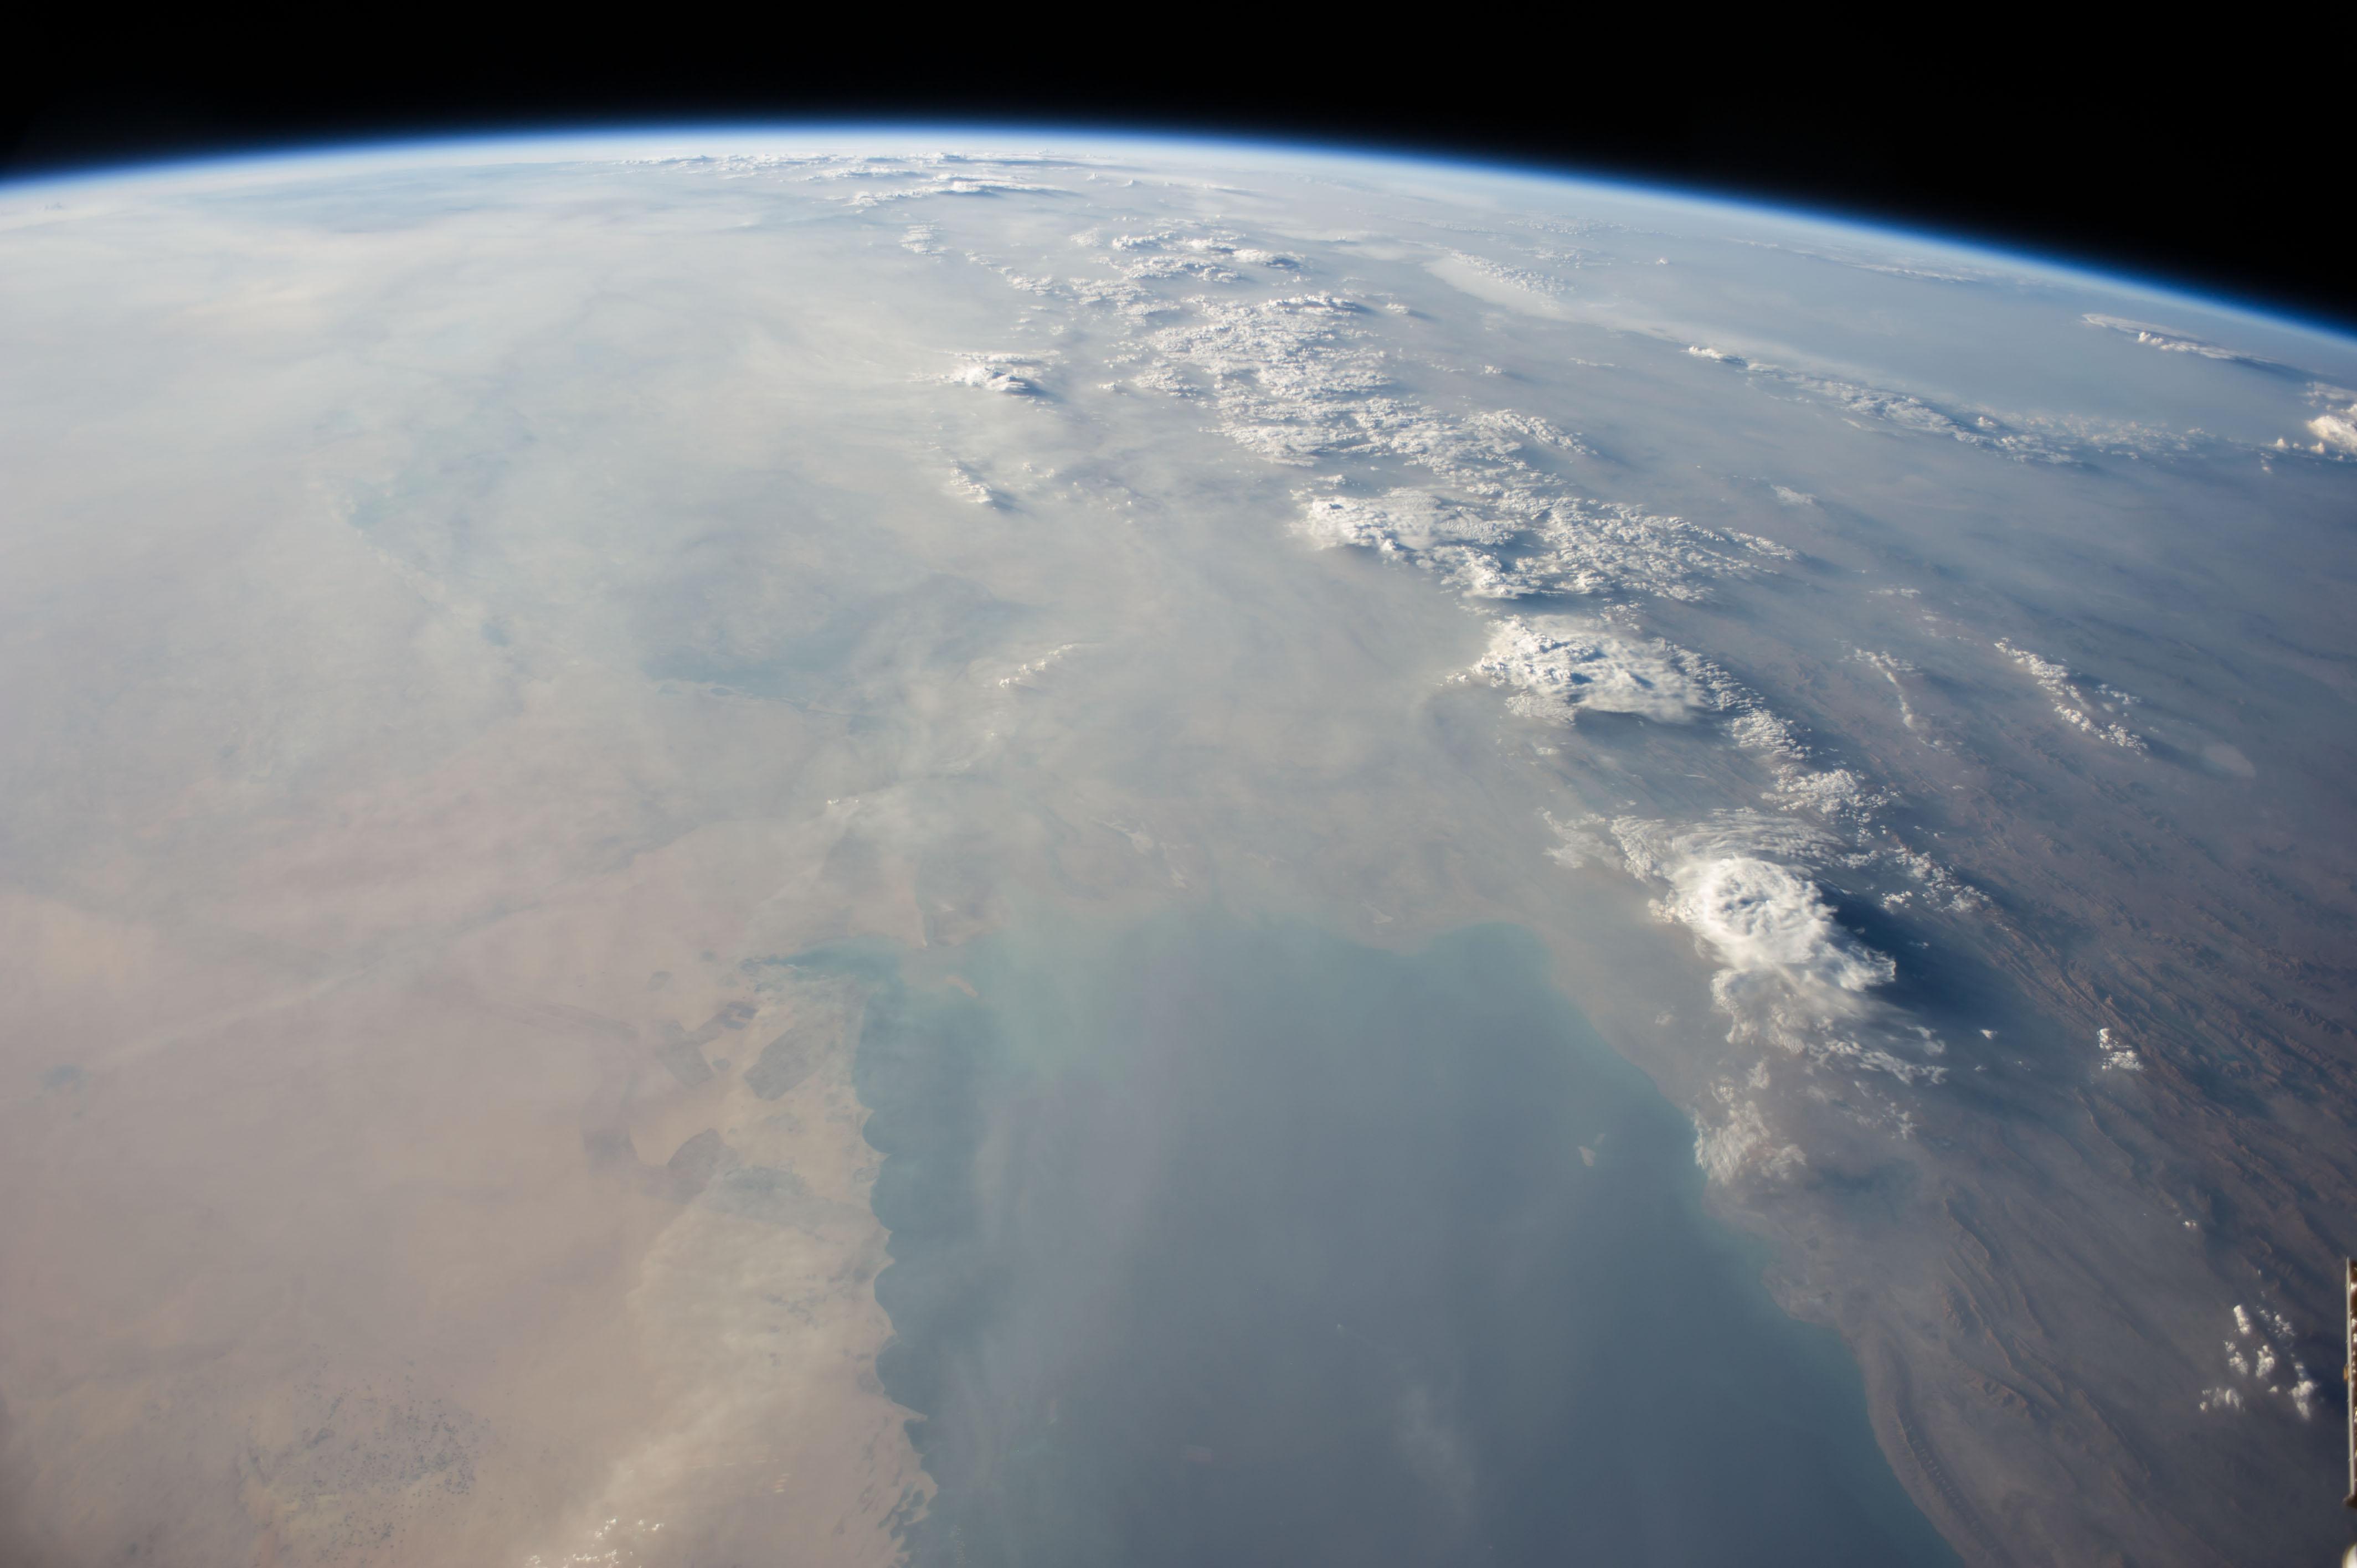 dust storms nasa - photo #13